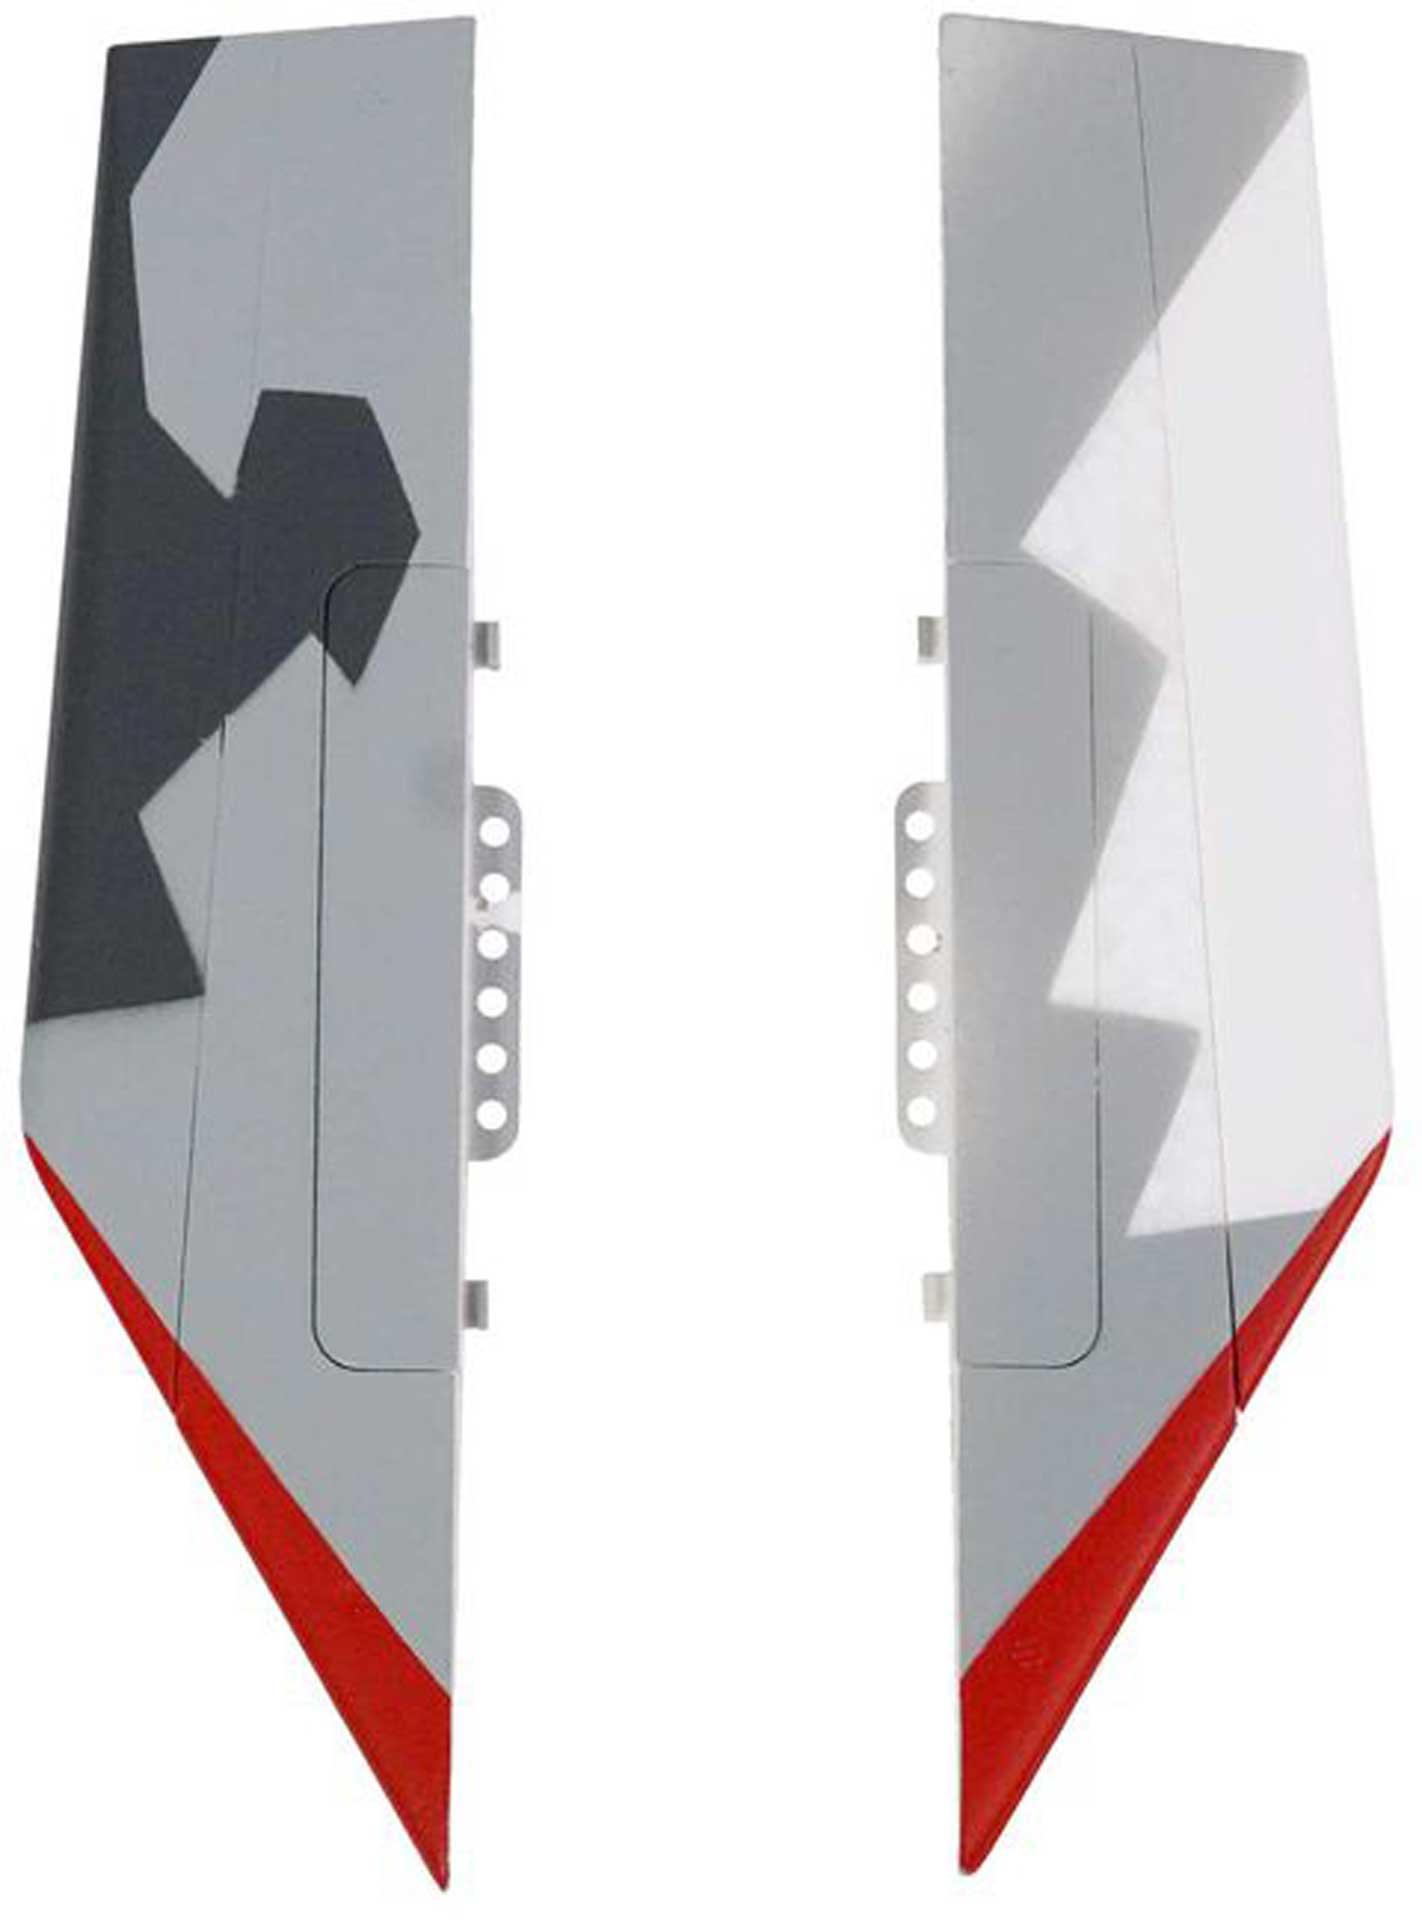 E-FLITE Ventral Fin Set: Viper 90mm EDF Jet